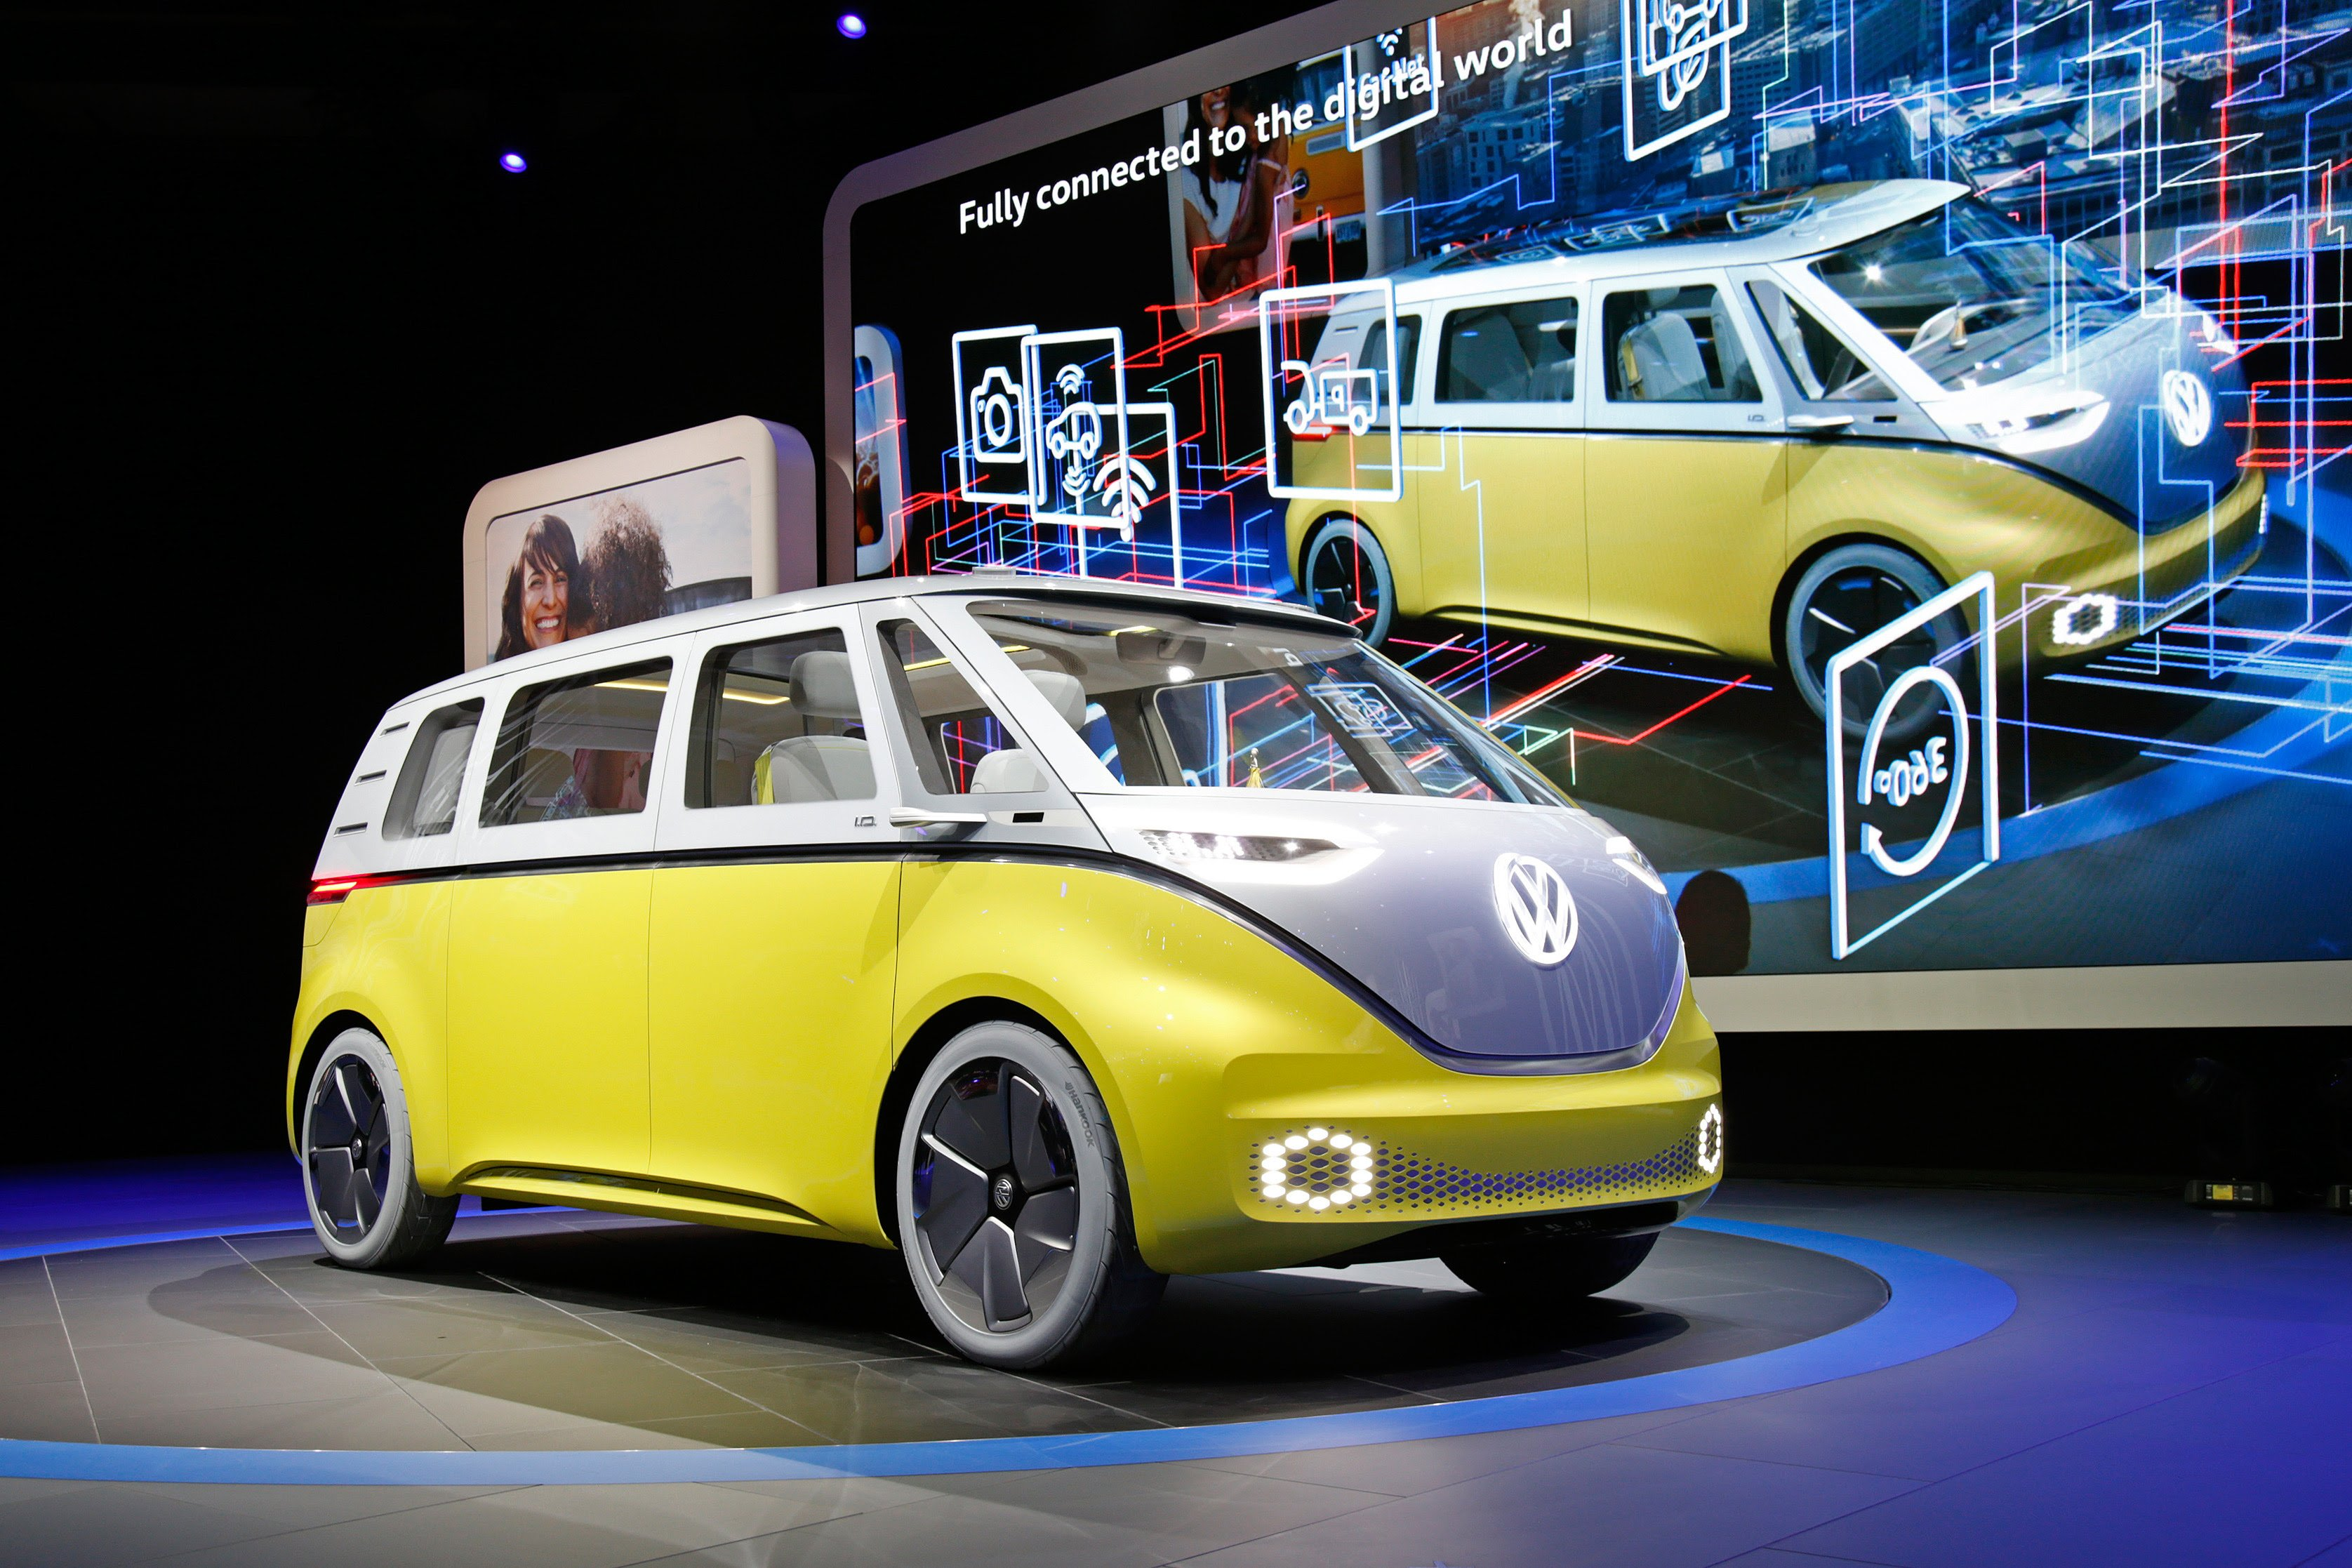 volkswagen i d buzz 2017 2.jpg?resize=300,169 - Volkswagen anuncia o retorno da Kombi: ela será elétrica com design futurista